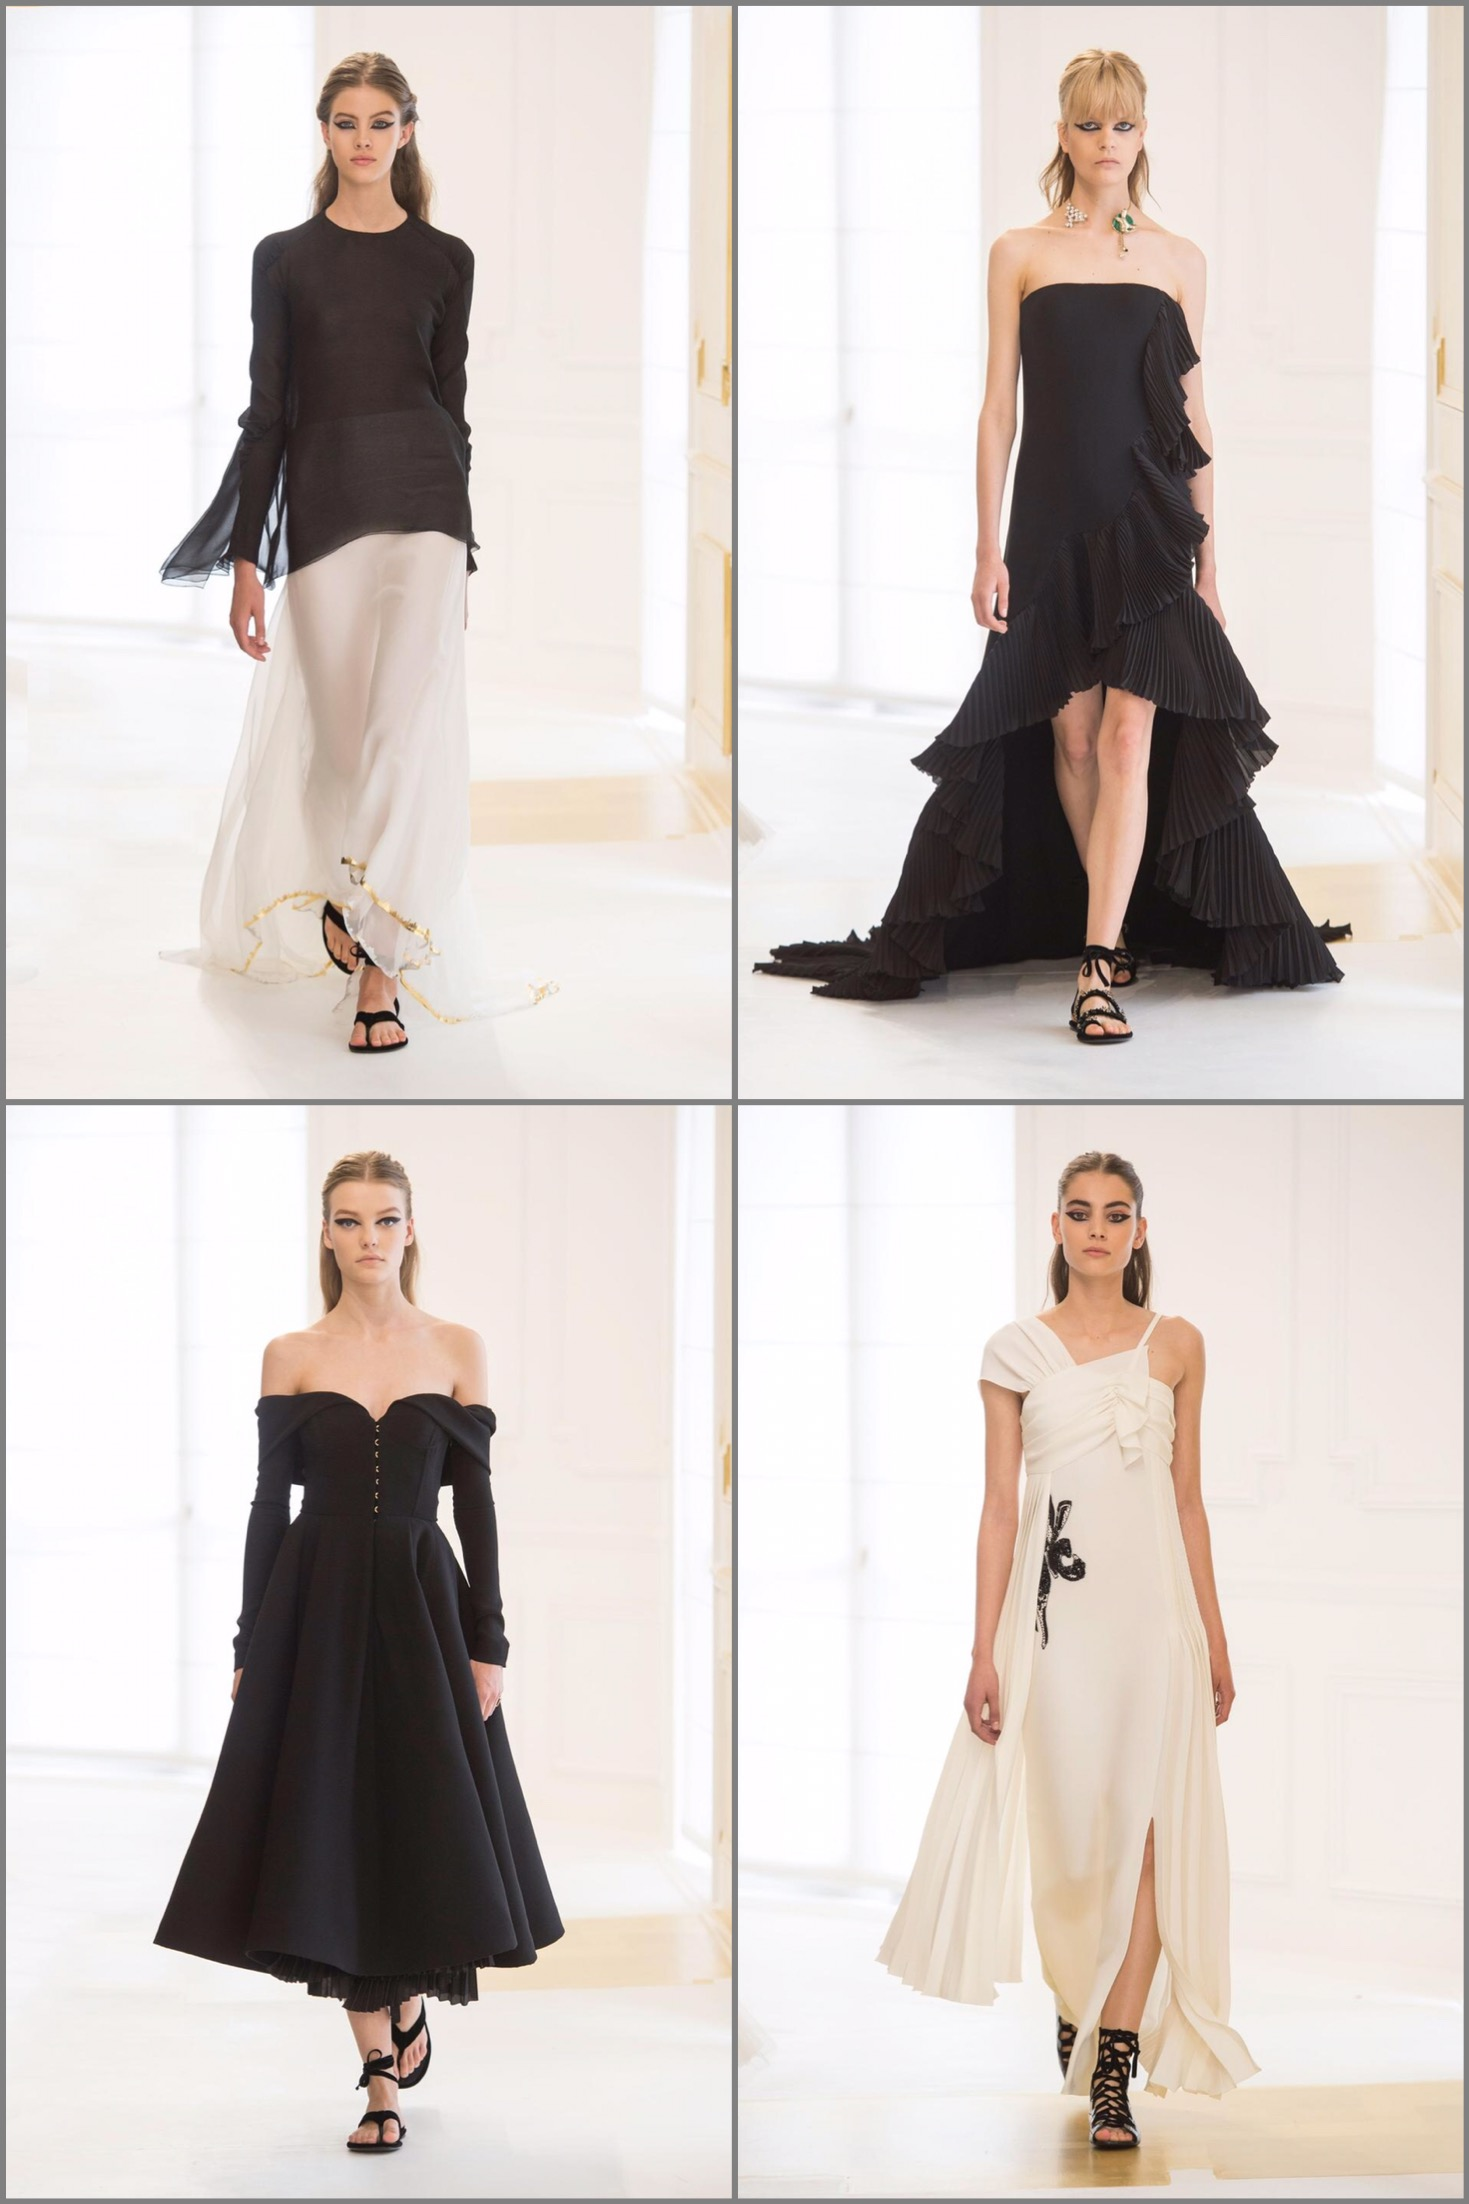 Paris Couture Week Fall Winter 2016-2017 - Christian Dior